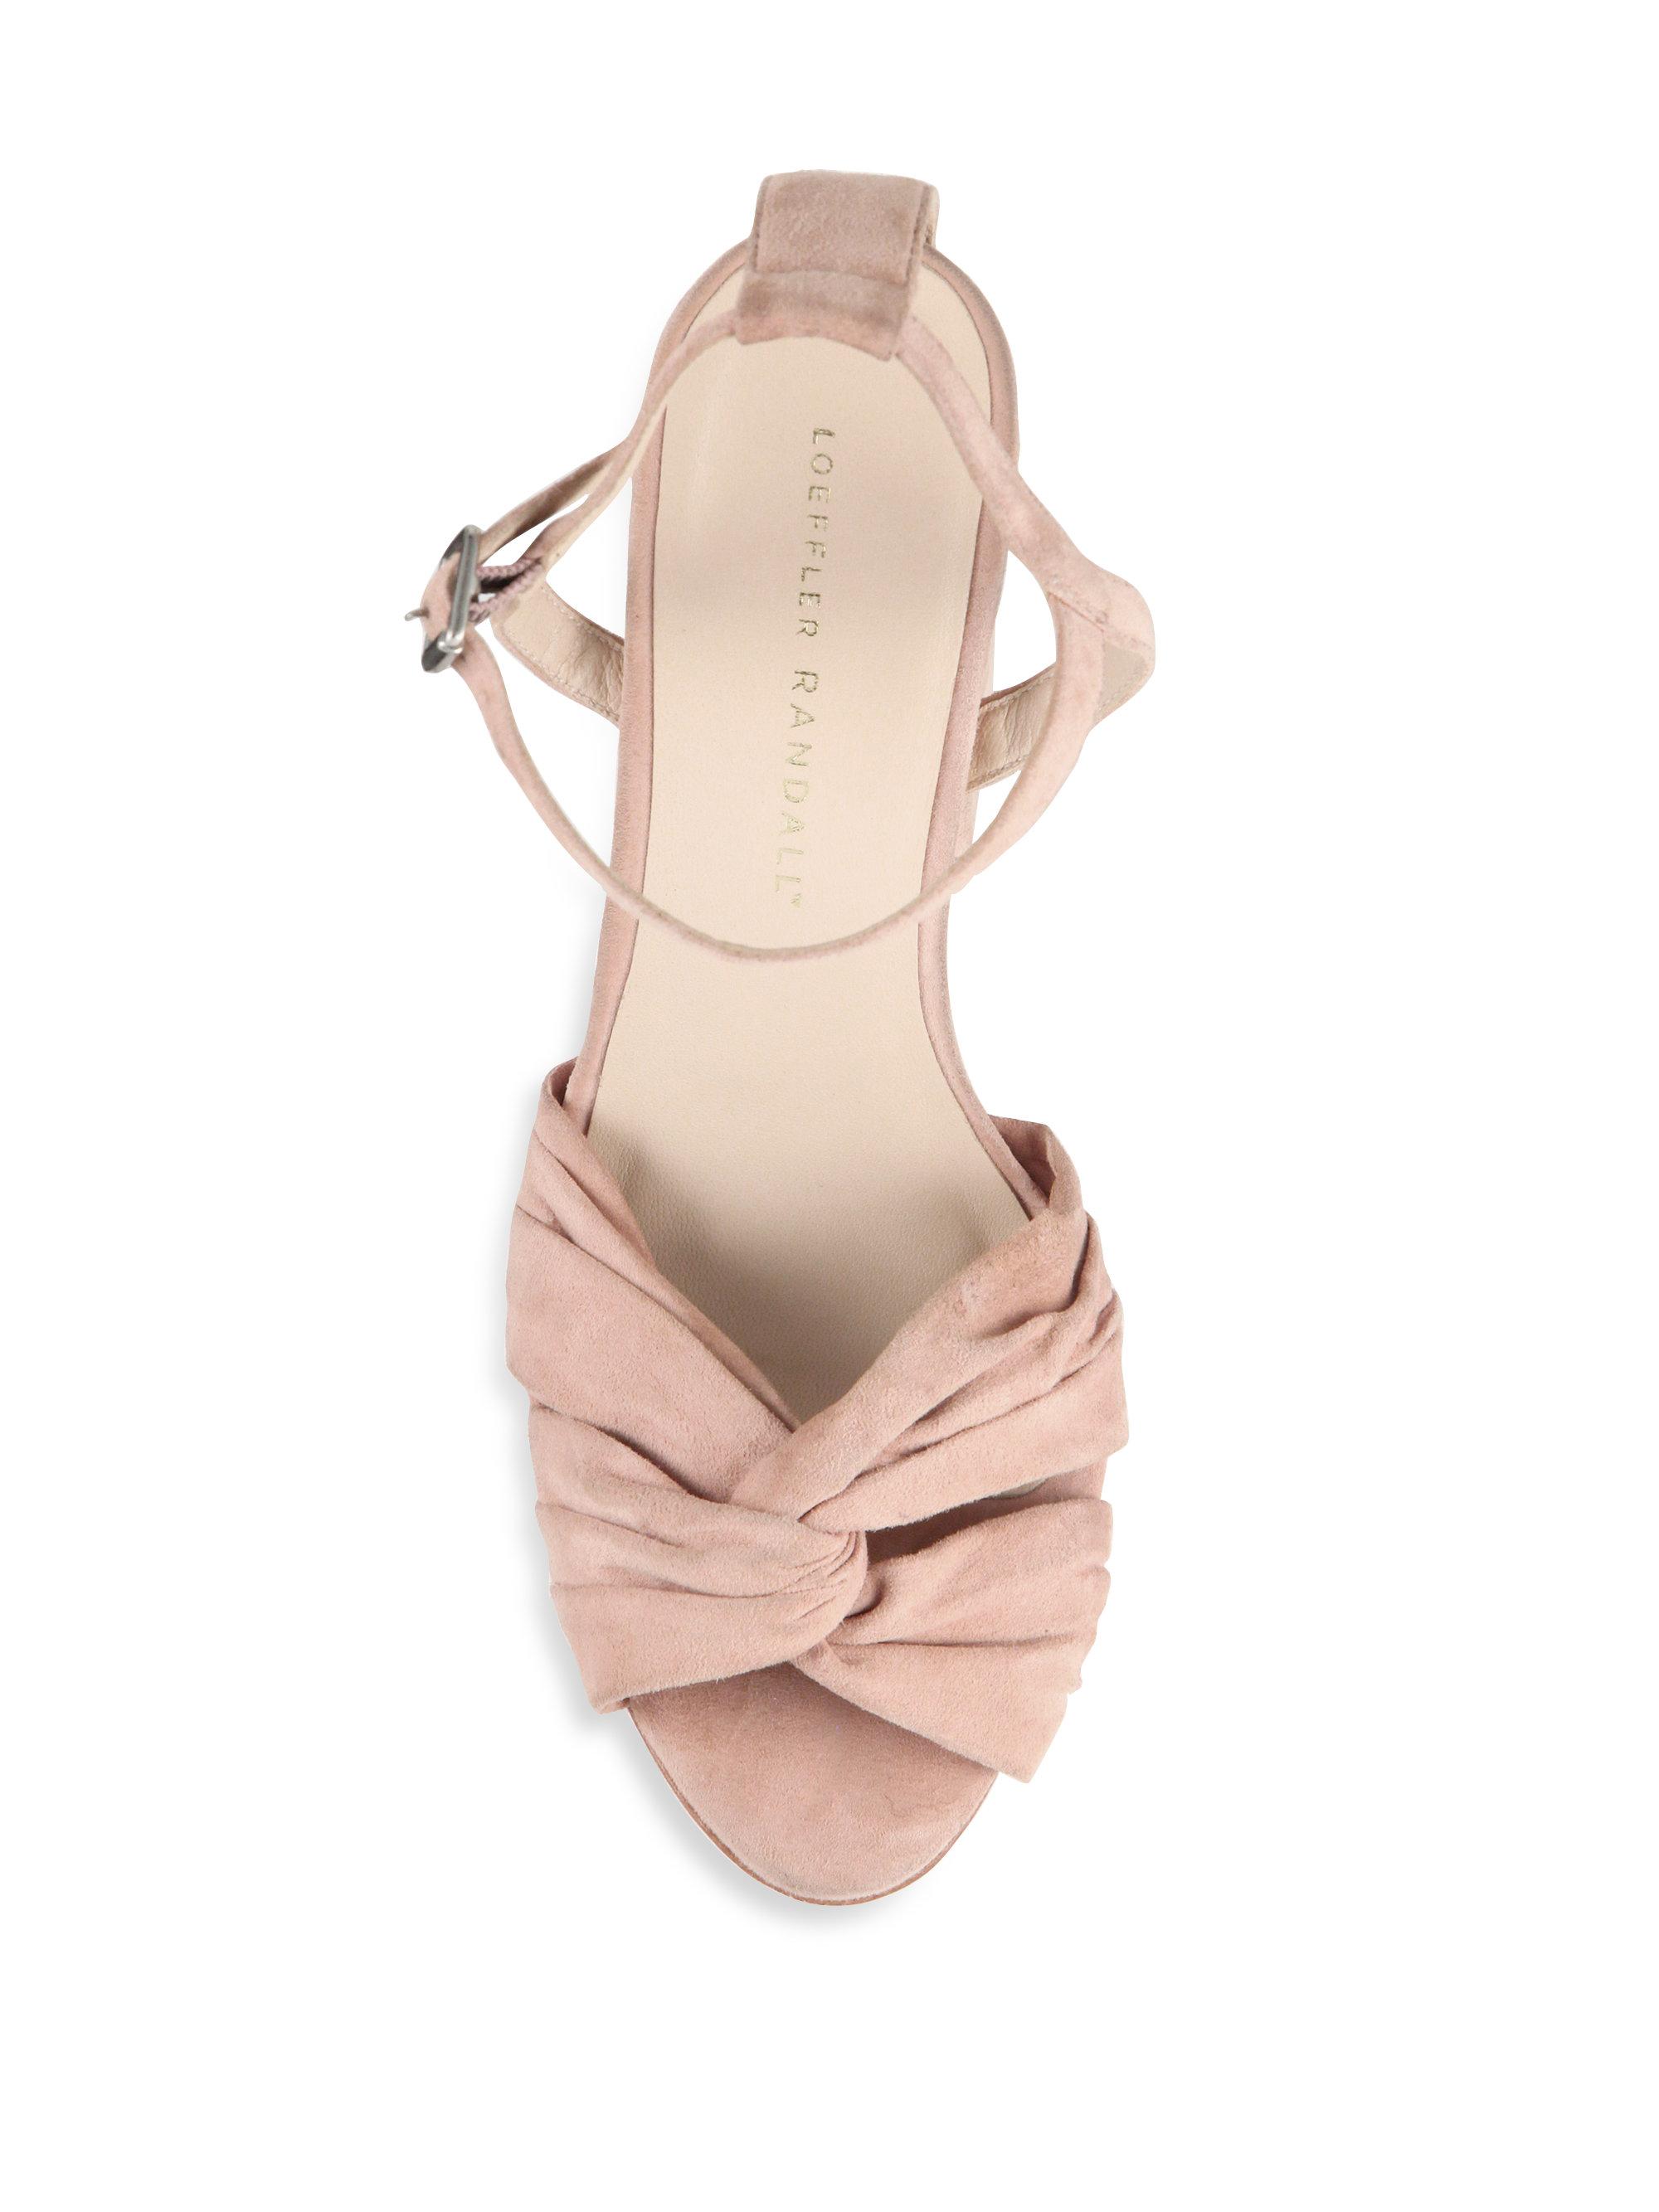 8a0076dcb77a Lyst - Loeffler Randall Arbella Suede Twist Platform Sandals in Pink